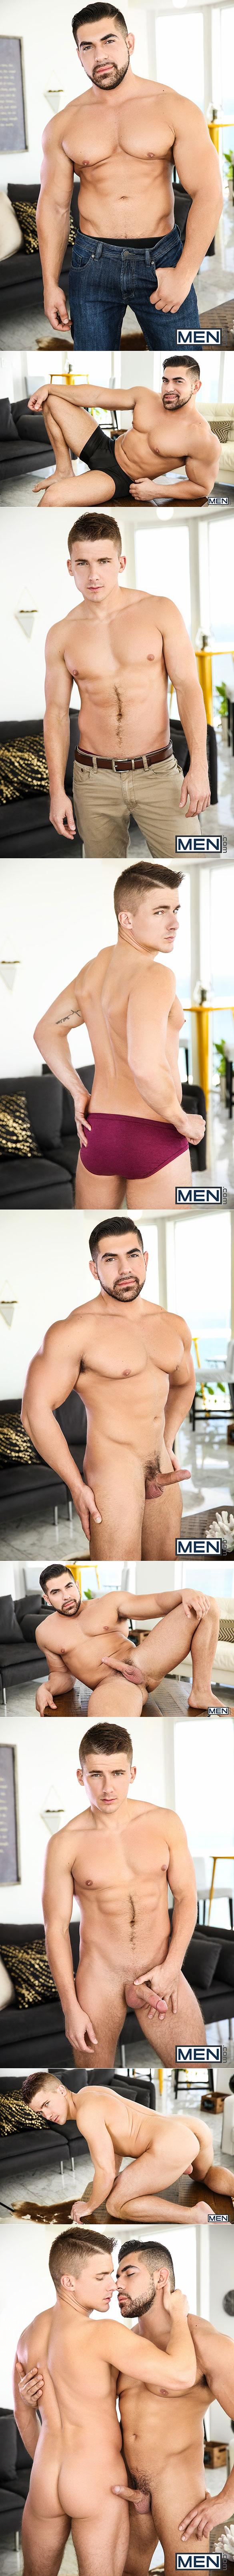 "Men.com: Damien Stone fucks Jake Porter in ""Masterclass, Part 2"""